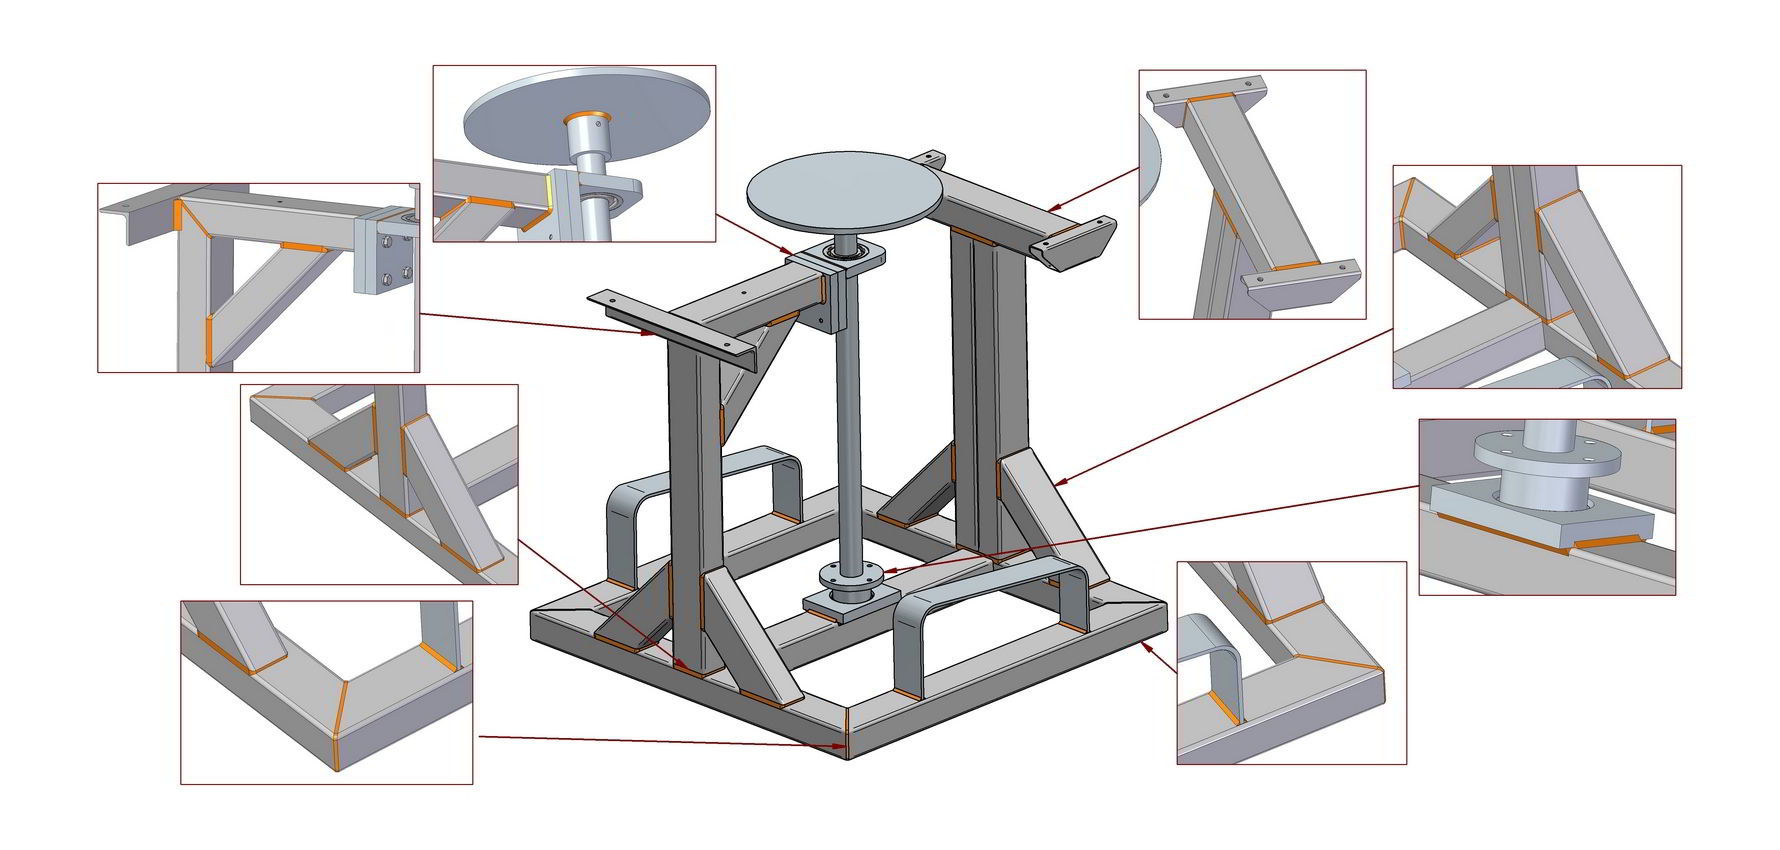 Fabrication Company Business Plan